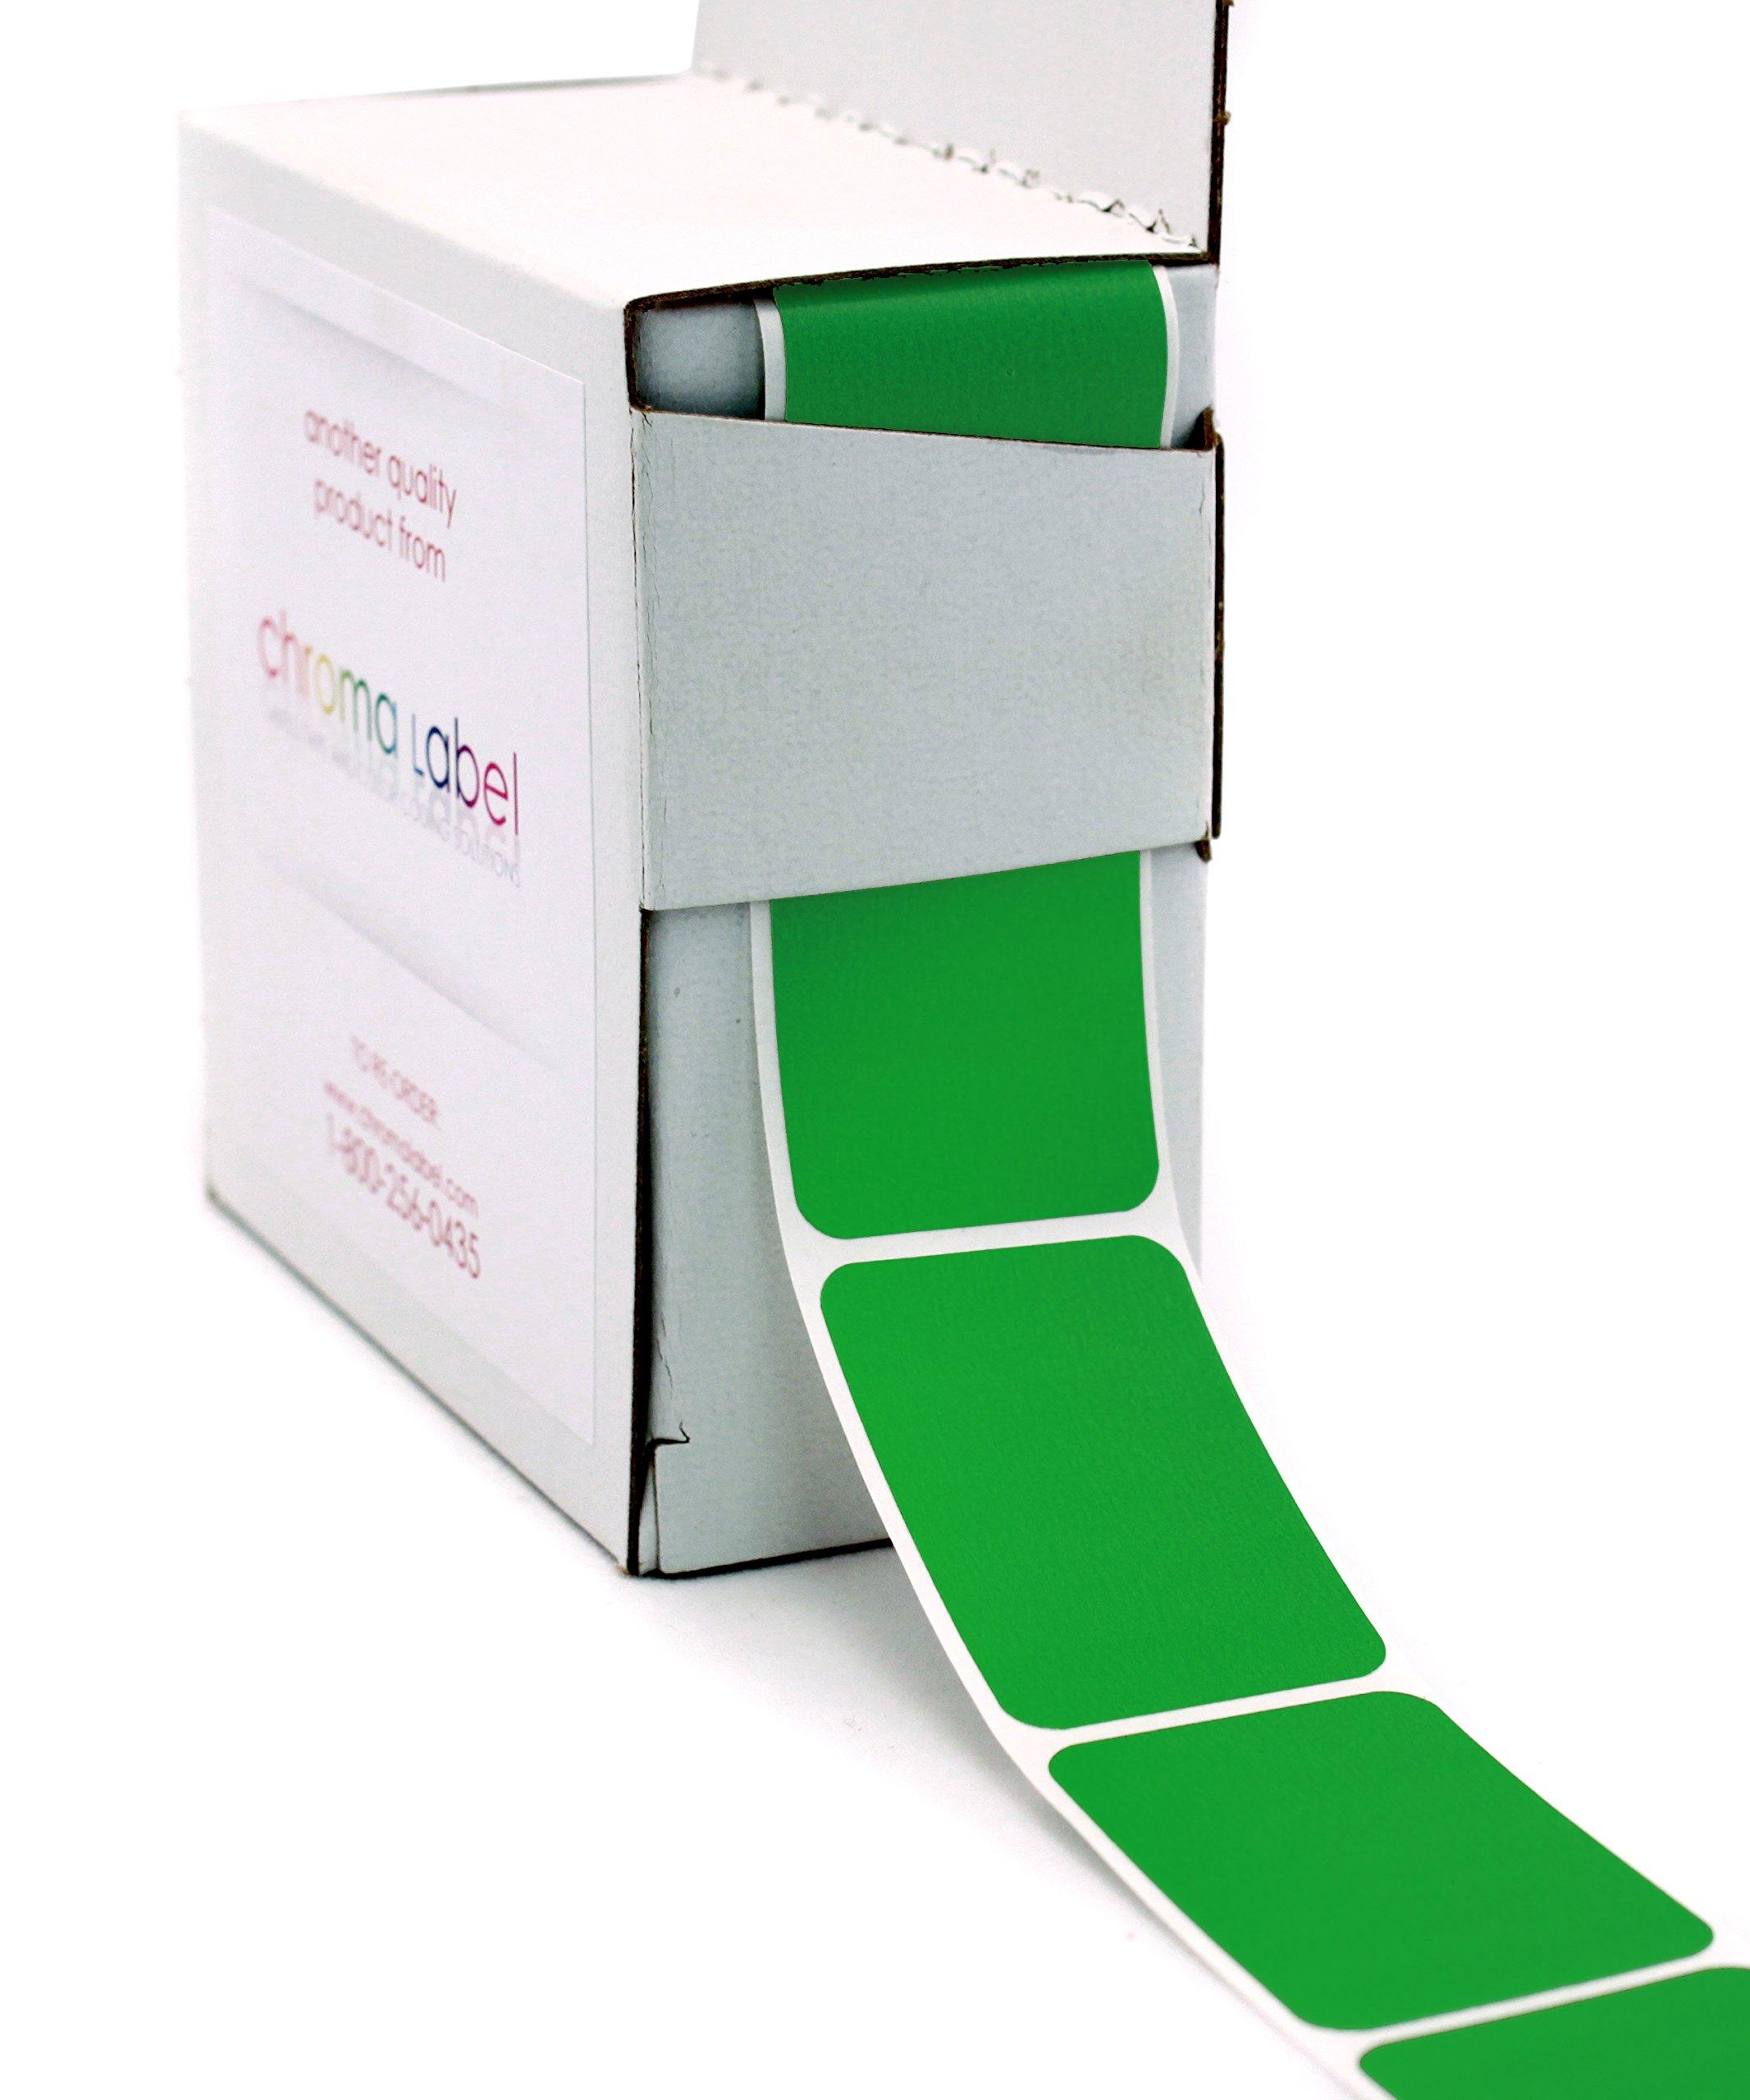 ChromaLabel 1 x 1-1/2 inch Color-Code Labels | 250/Dispenser Box (Green)